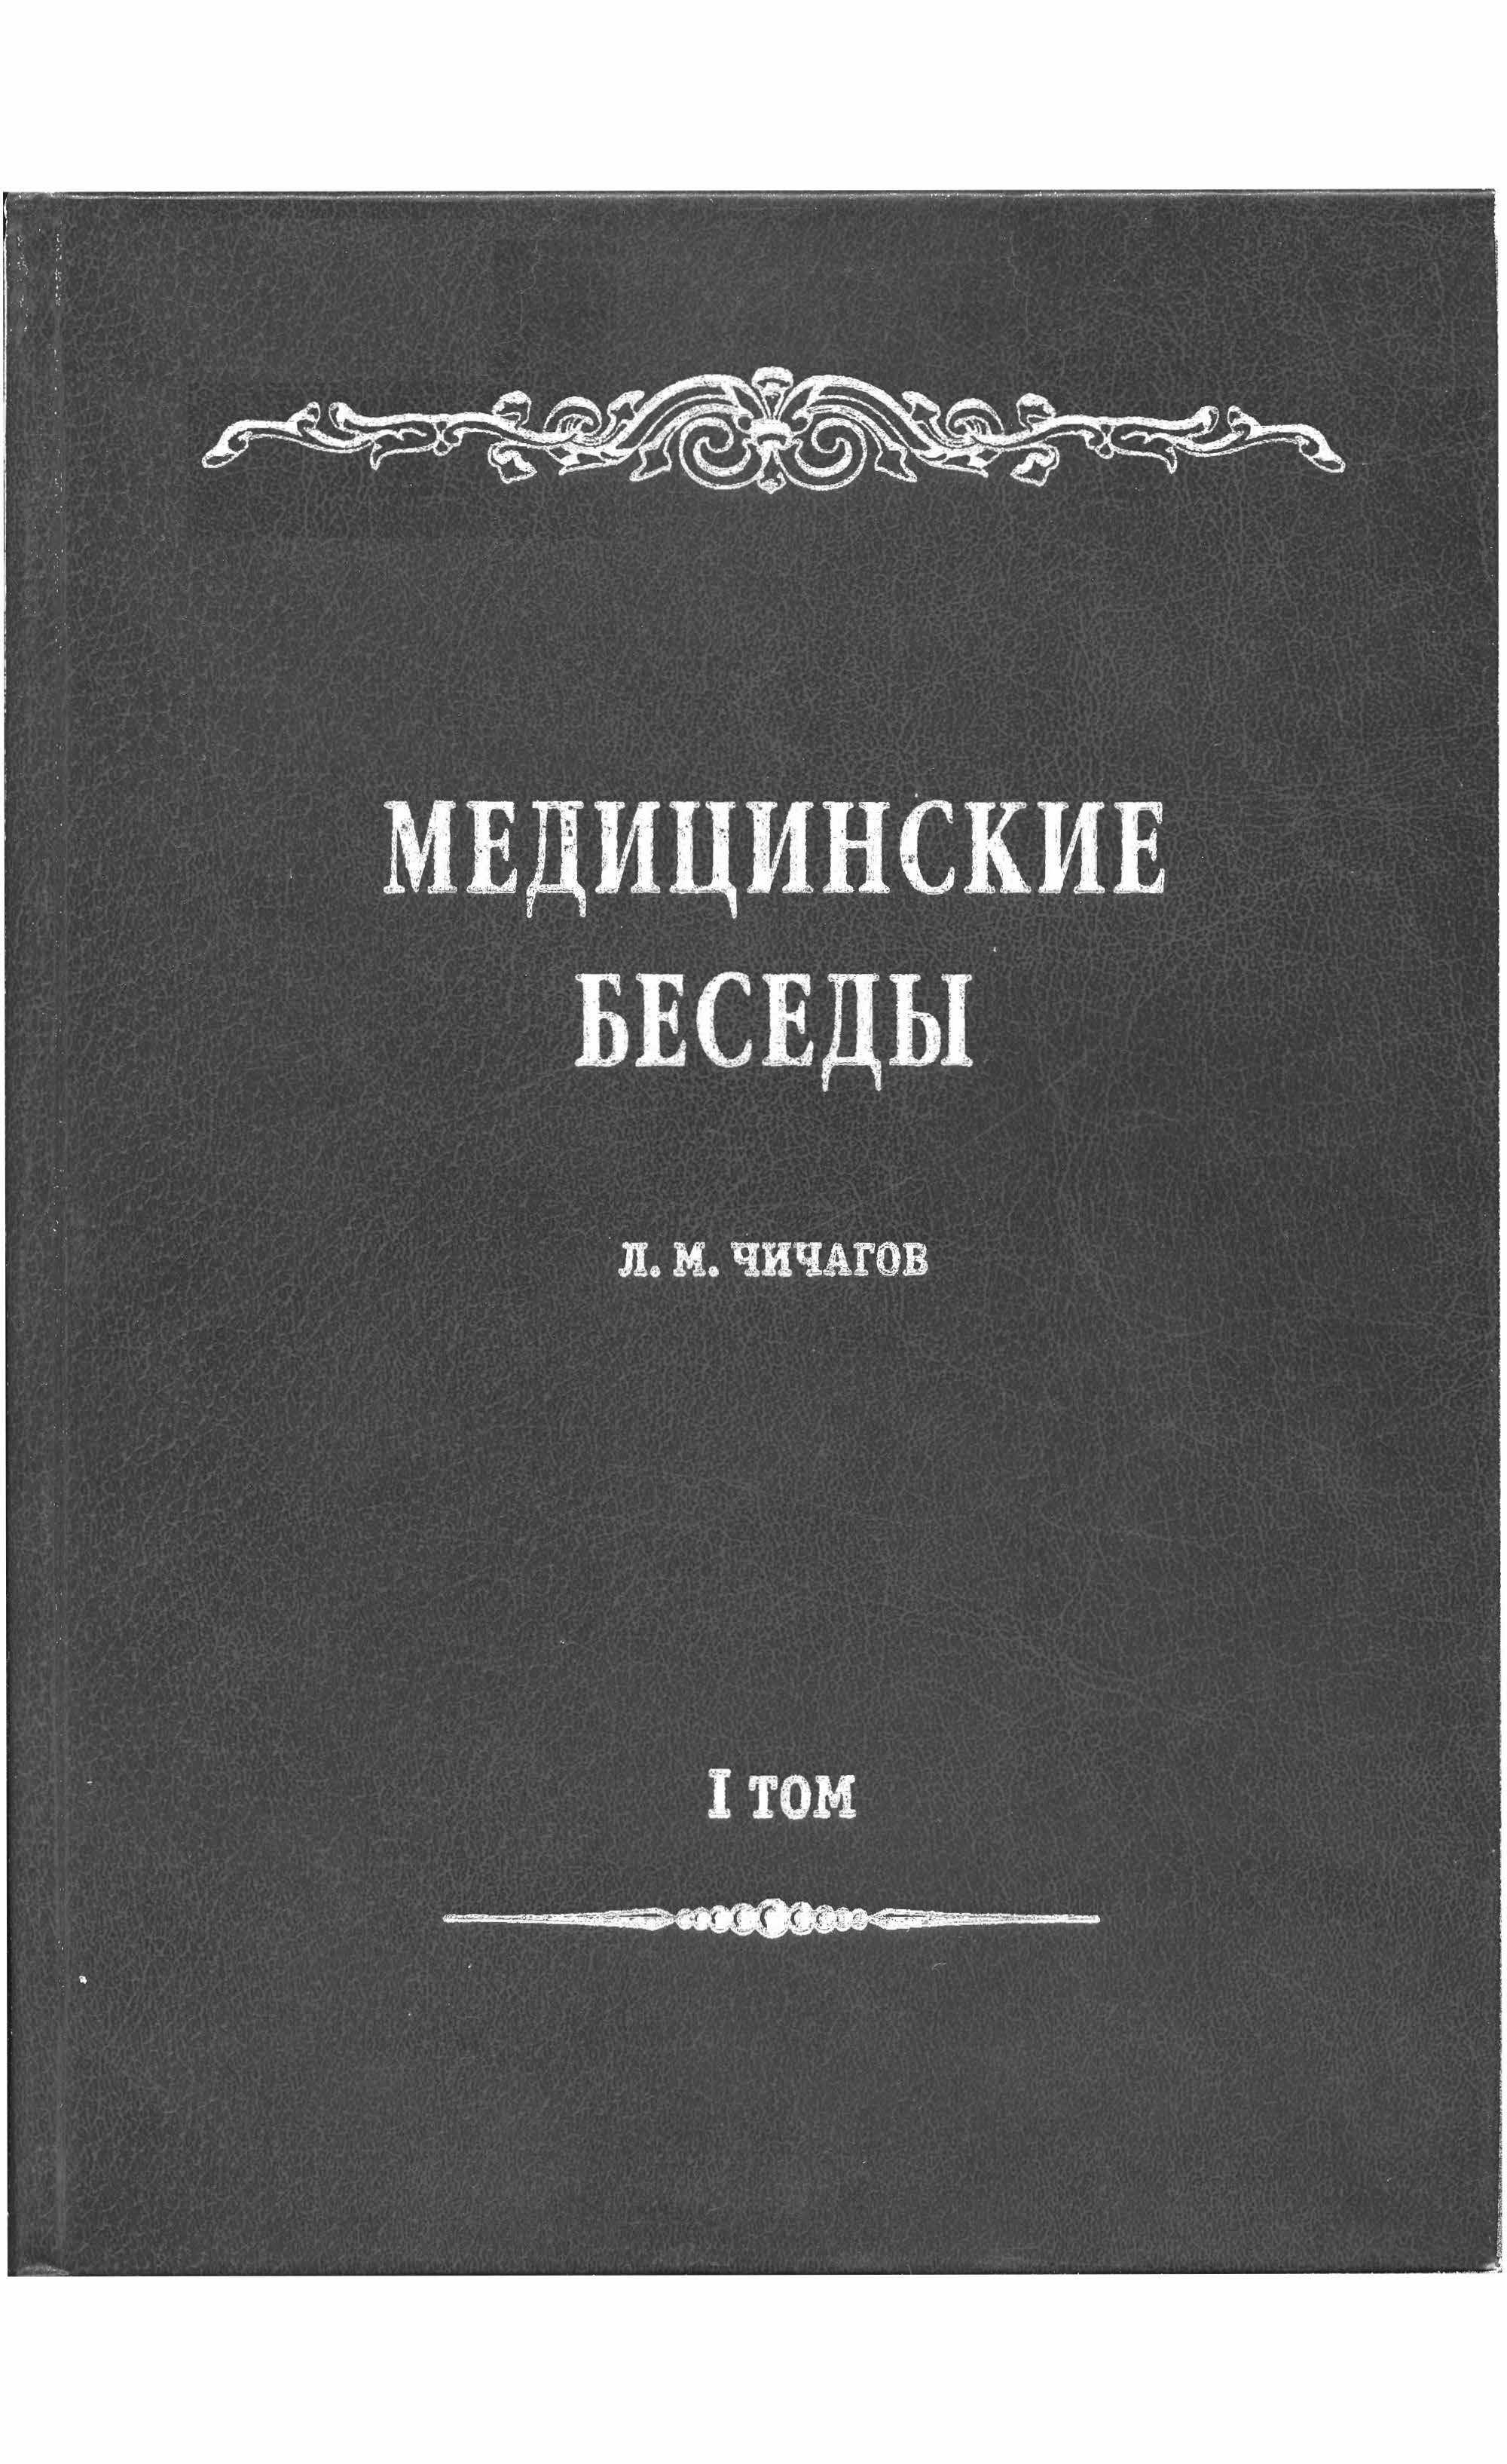 http://s3.uploads.ru/dW9Gz.jpg